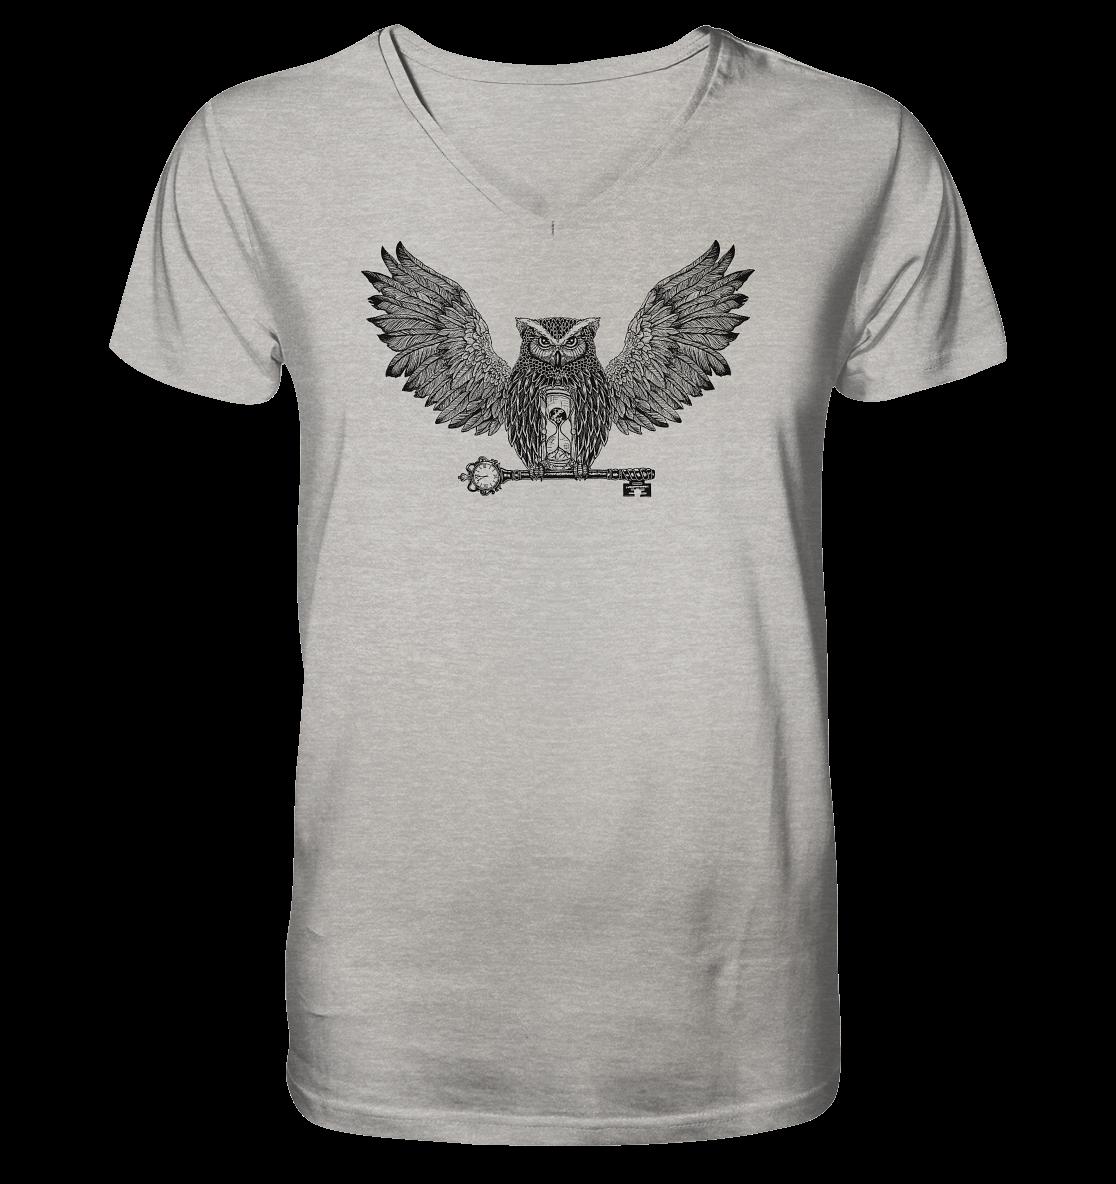 front-mens-organic-v-neck-shirt-c2c1c0-1116x-4.png